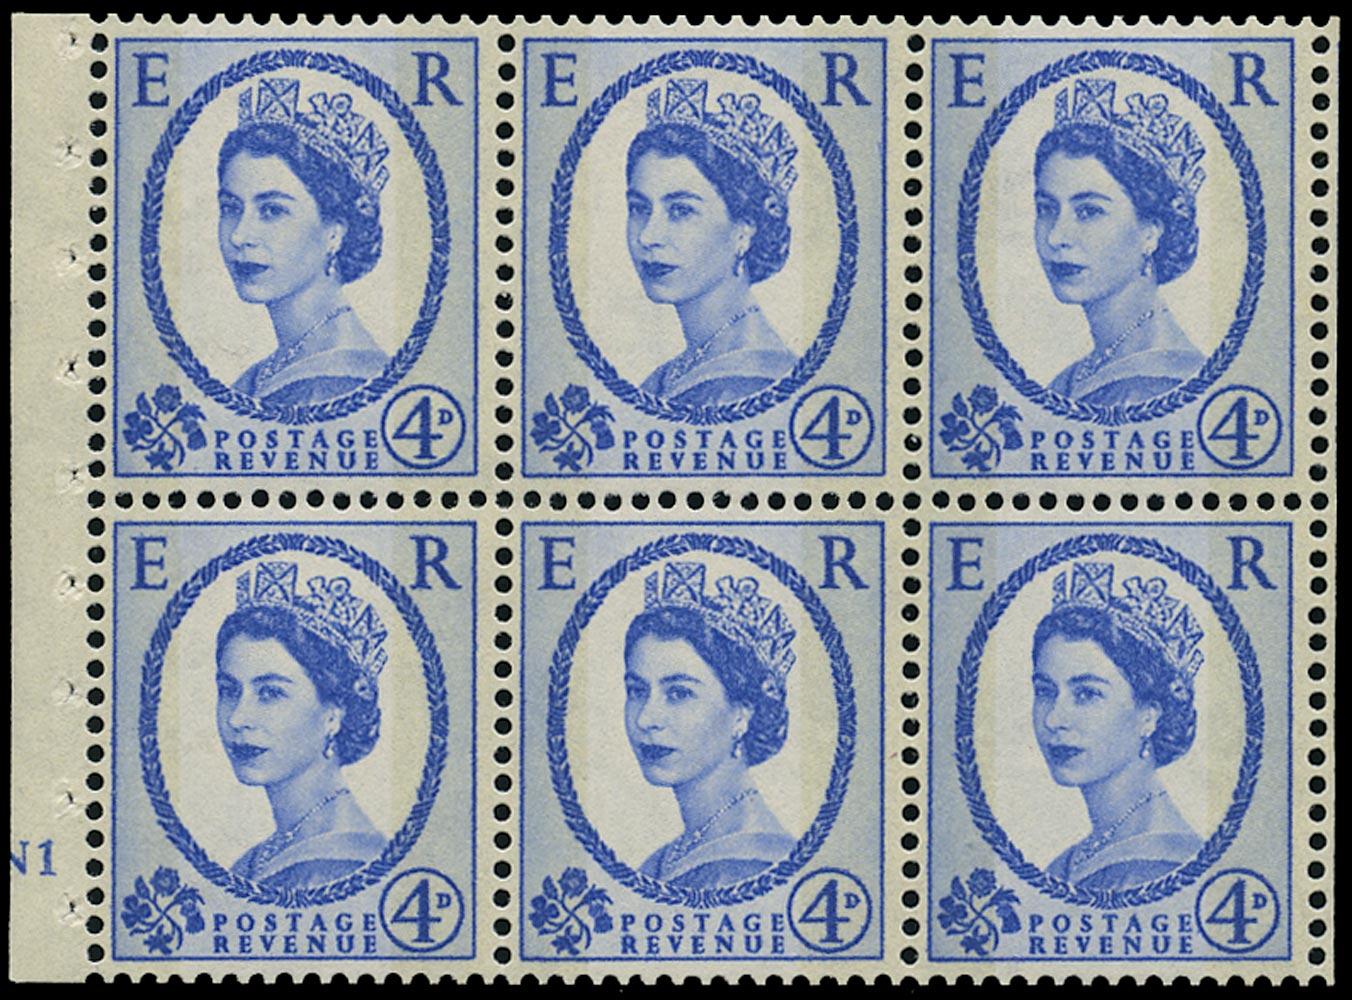 GB 1967  SG616al Booklet pane - N1 No Dot pane with 'Y' flaw